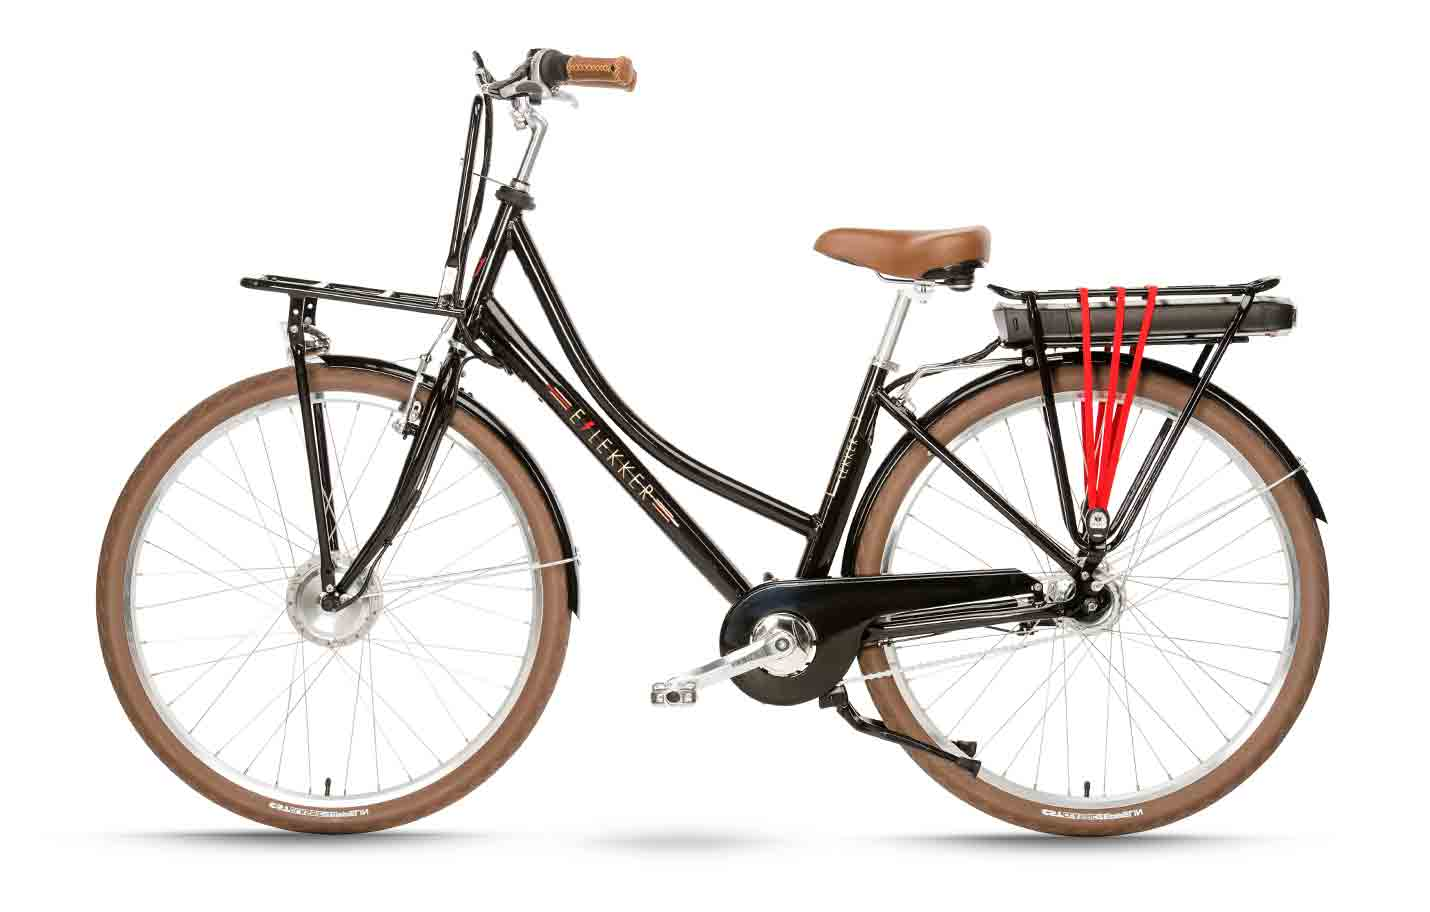 Lekker-Bikes-Ebike-Classic-Black-Jordaan-Womens